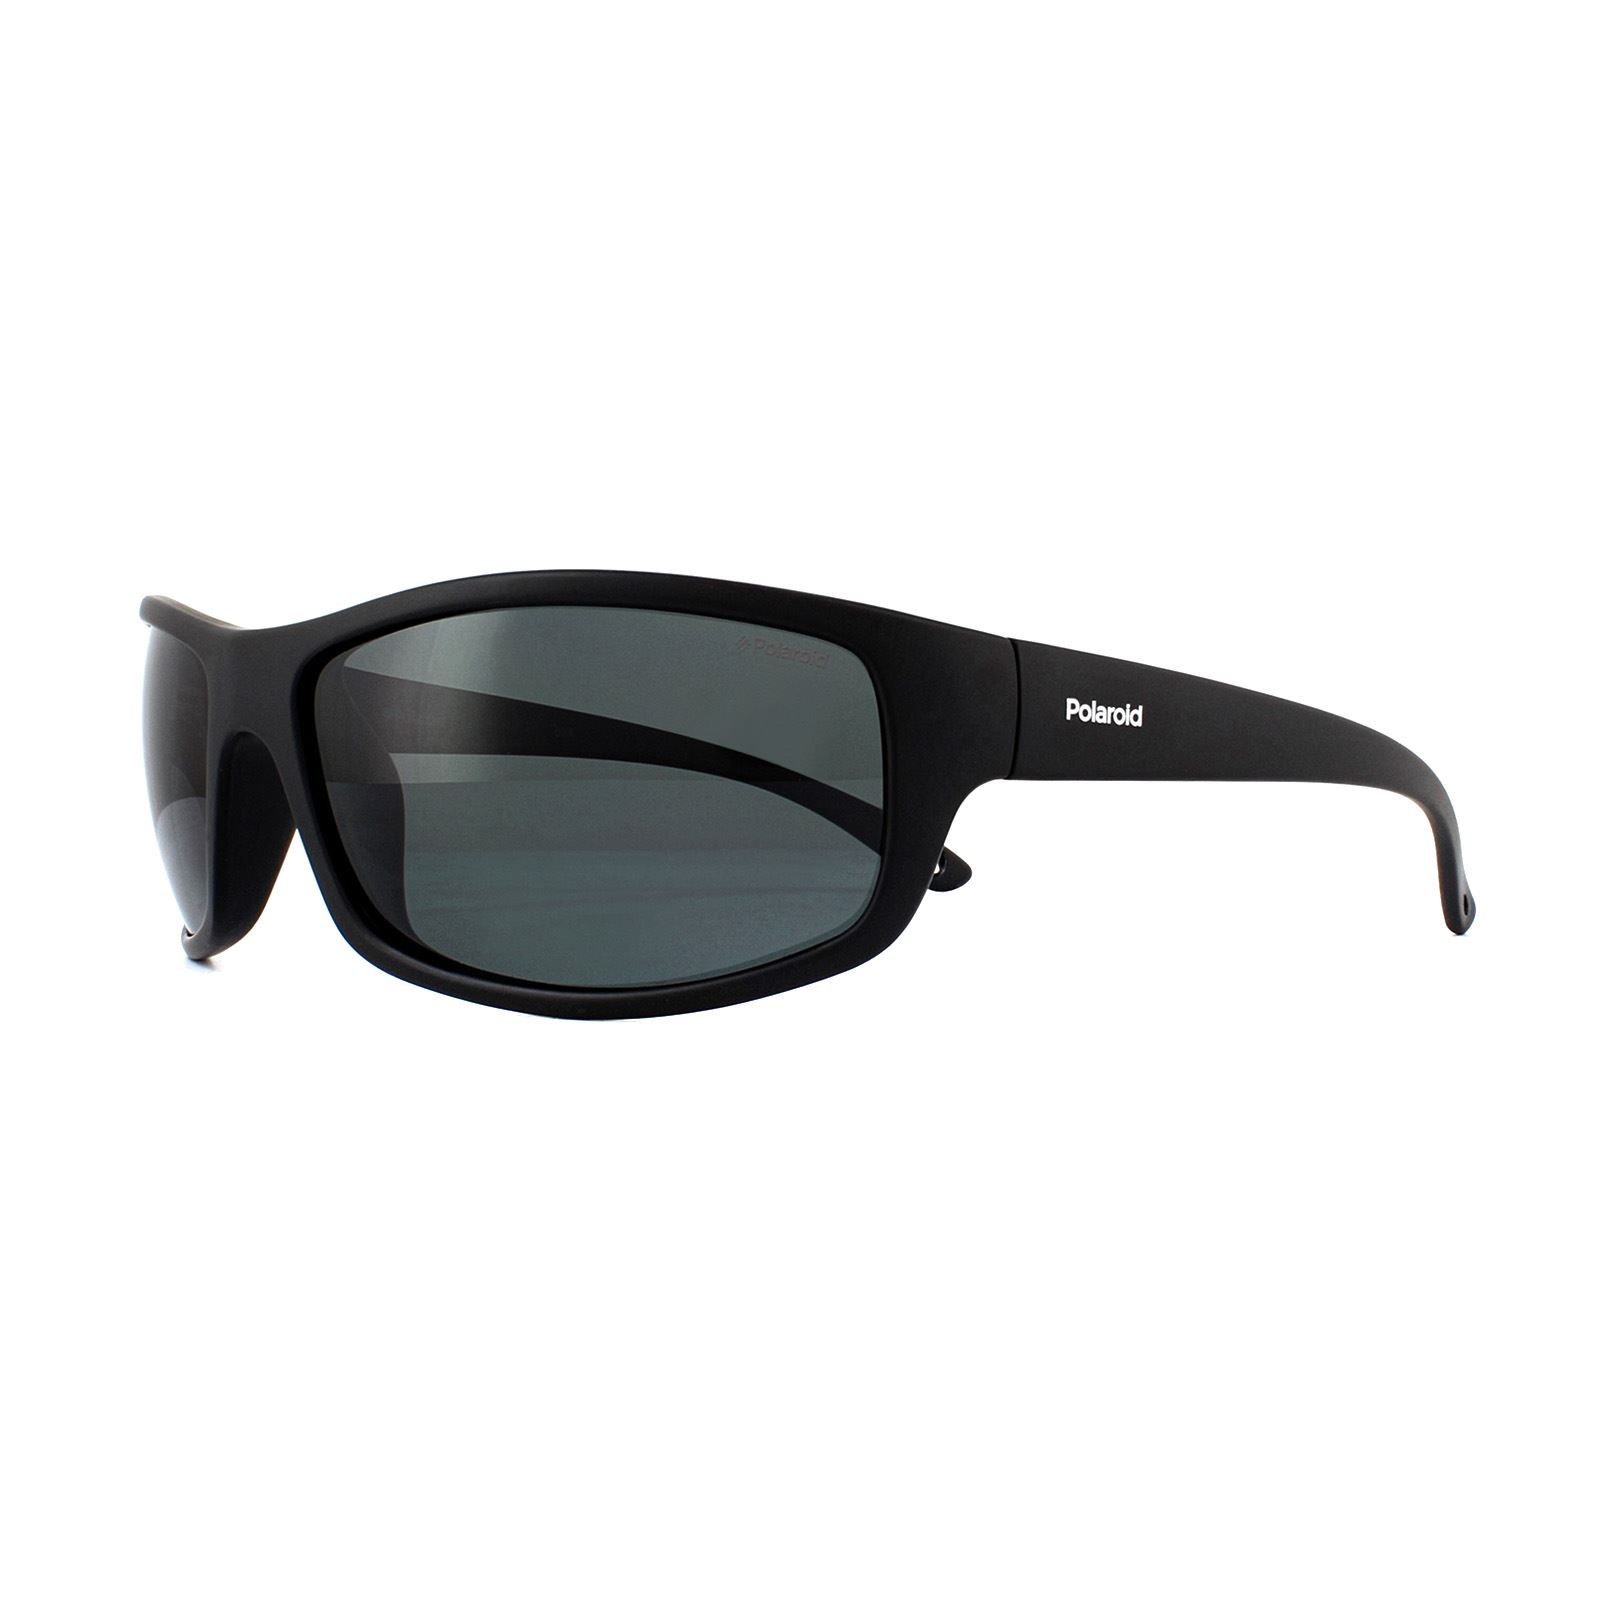 Polaroid Sport Sunglasses PLD 7017/S 807 M9 Black Grey Polarized